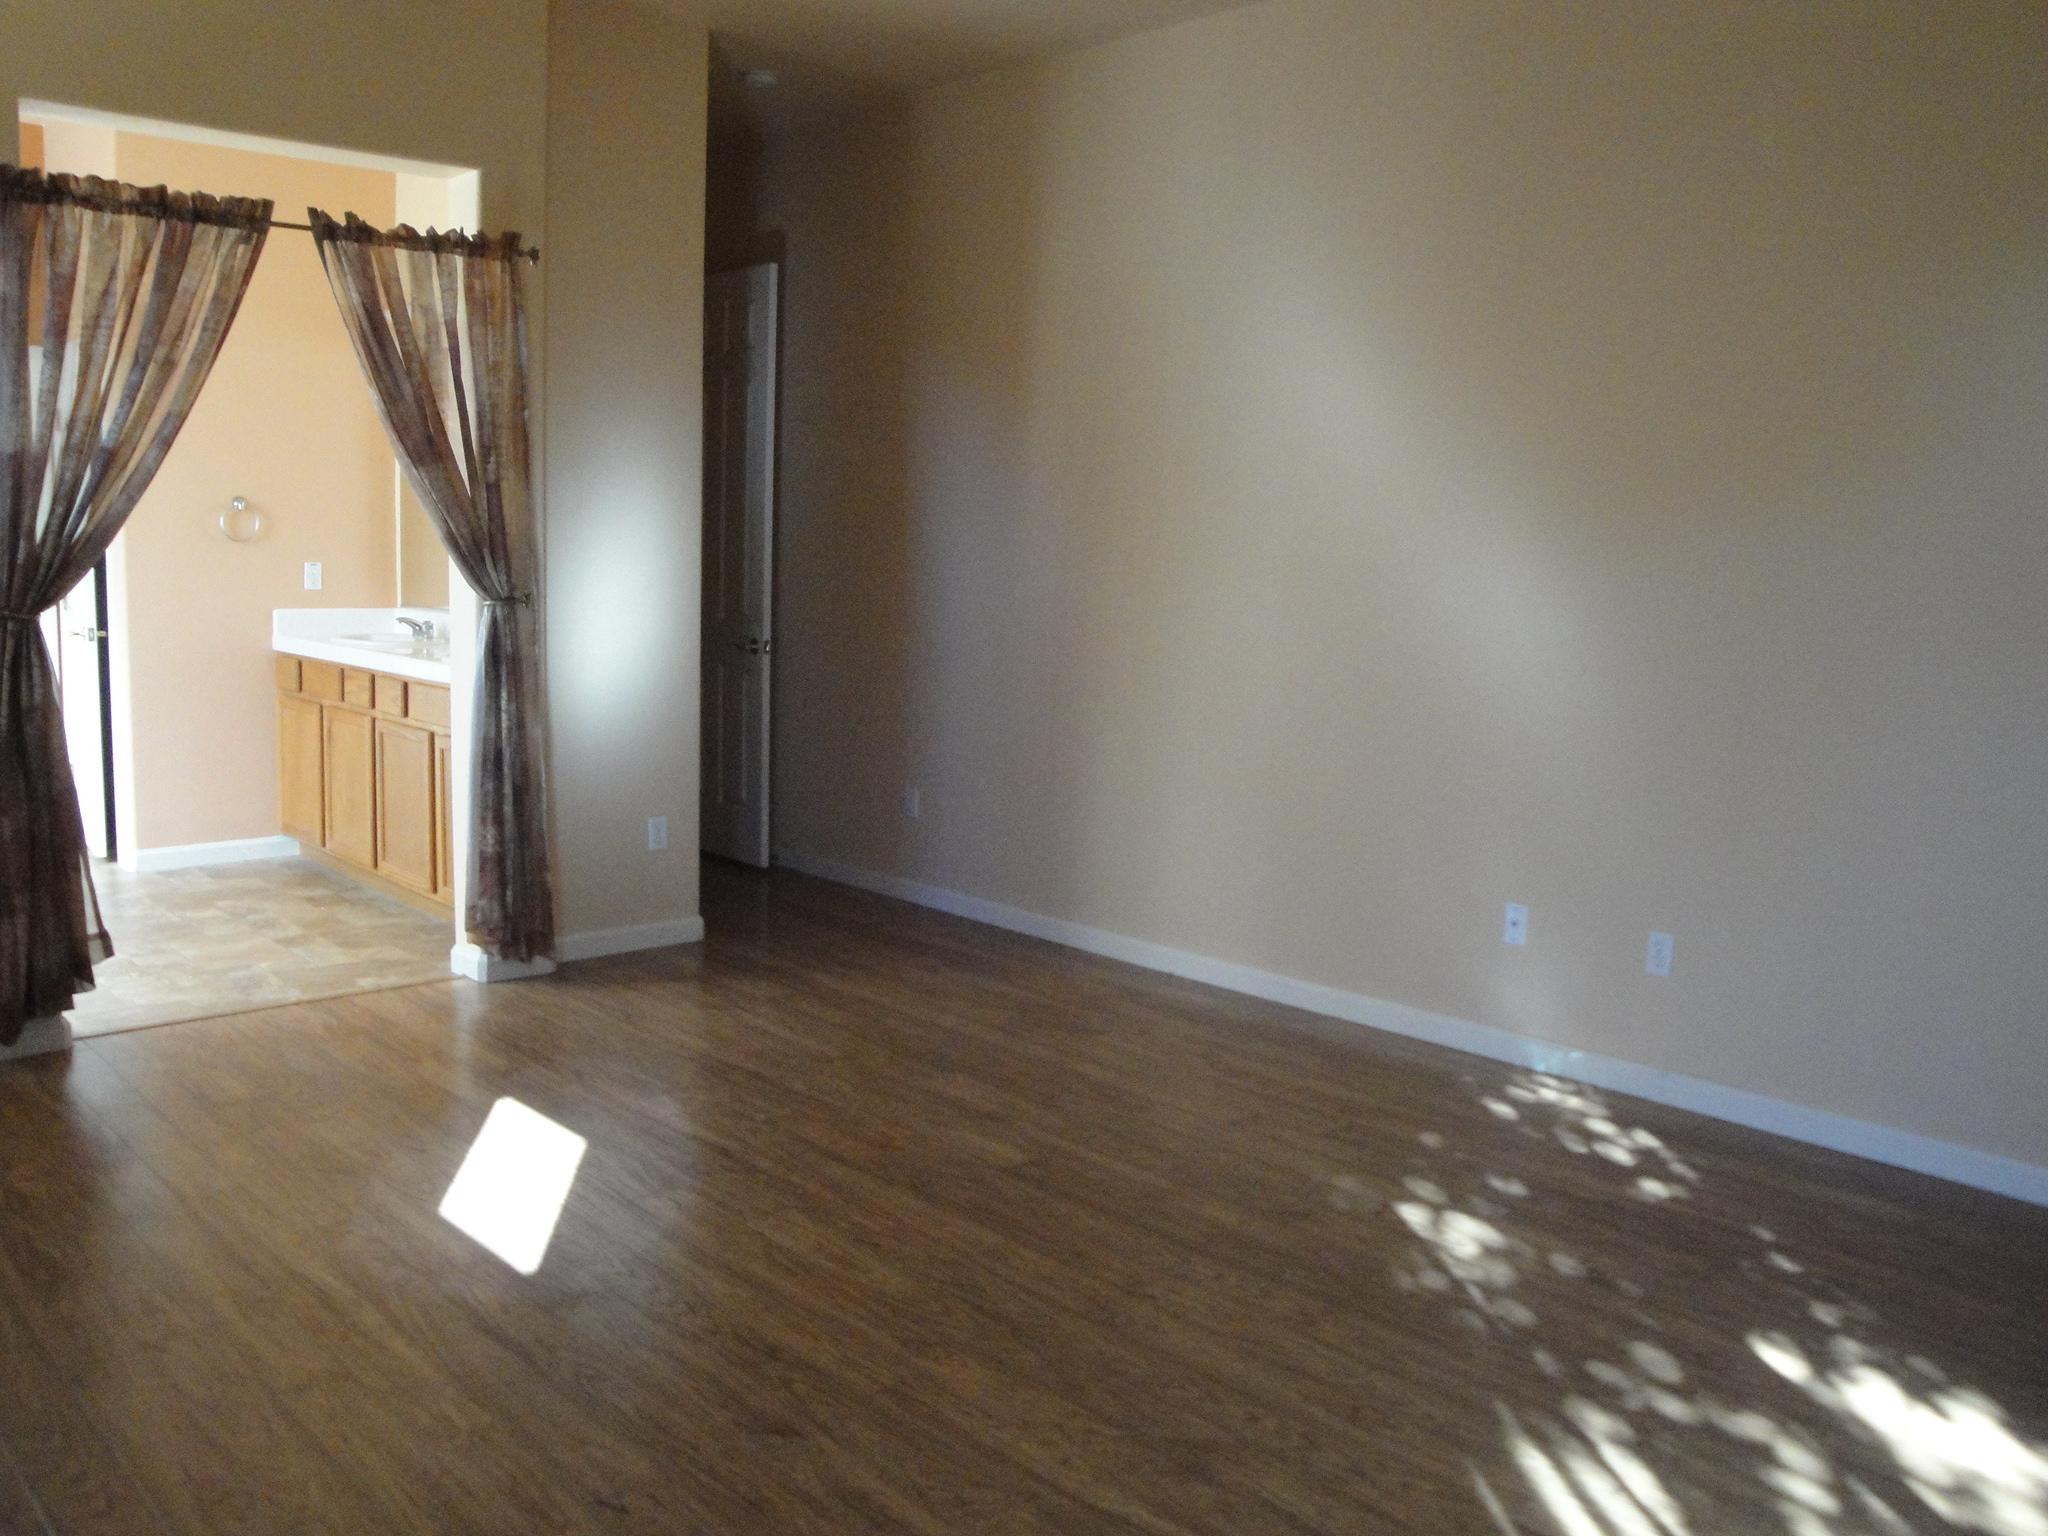 Photo of 9878 Spring View Way, Elk Grove, CA 95757